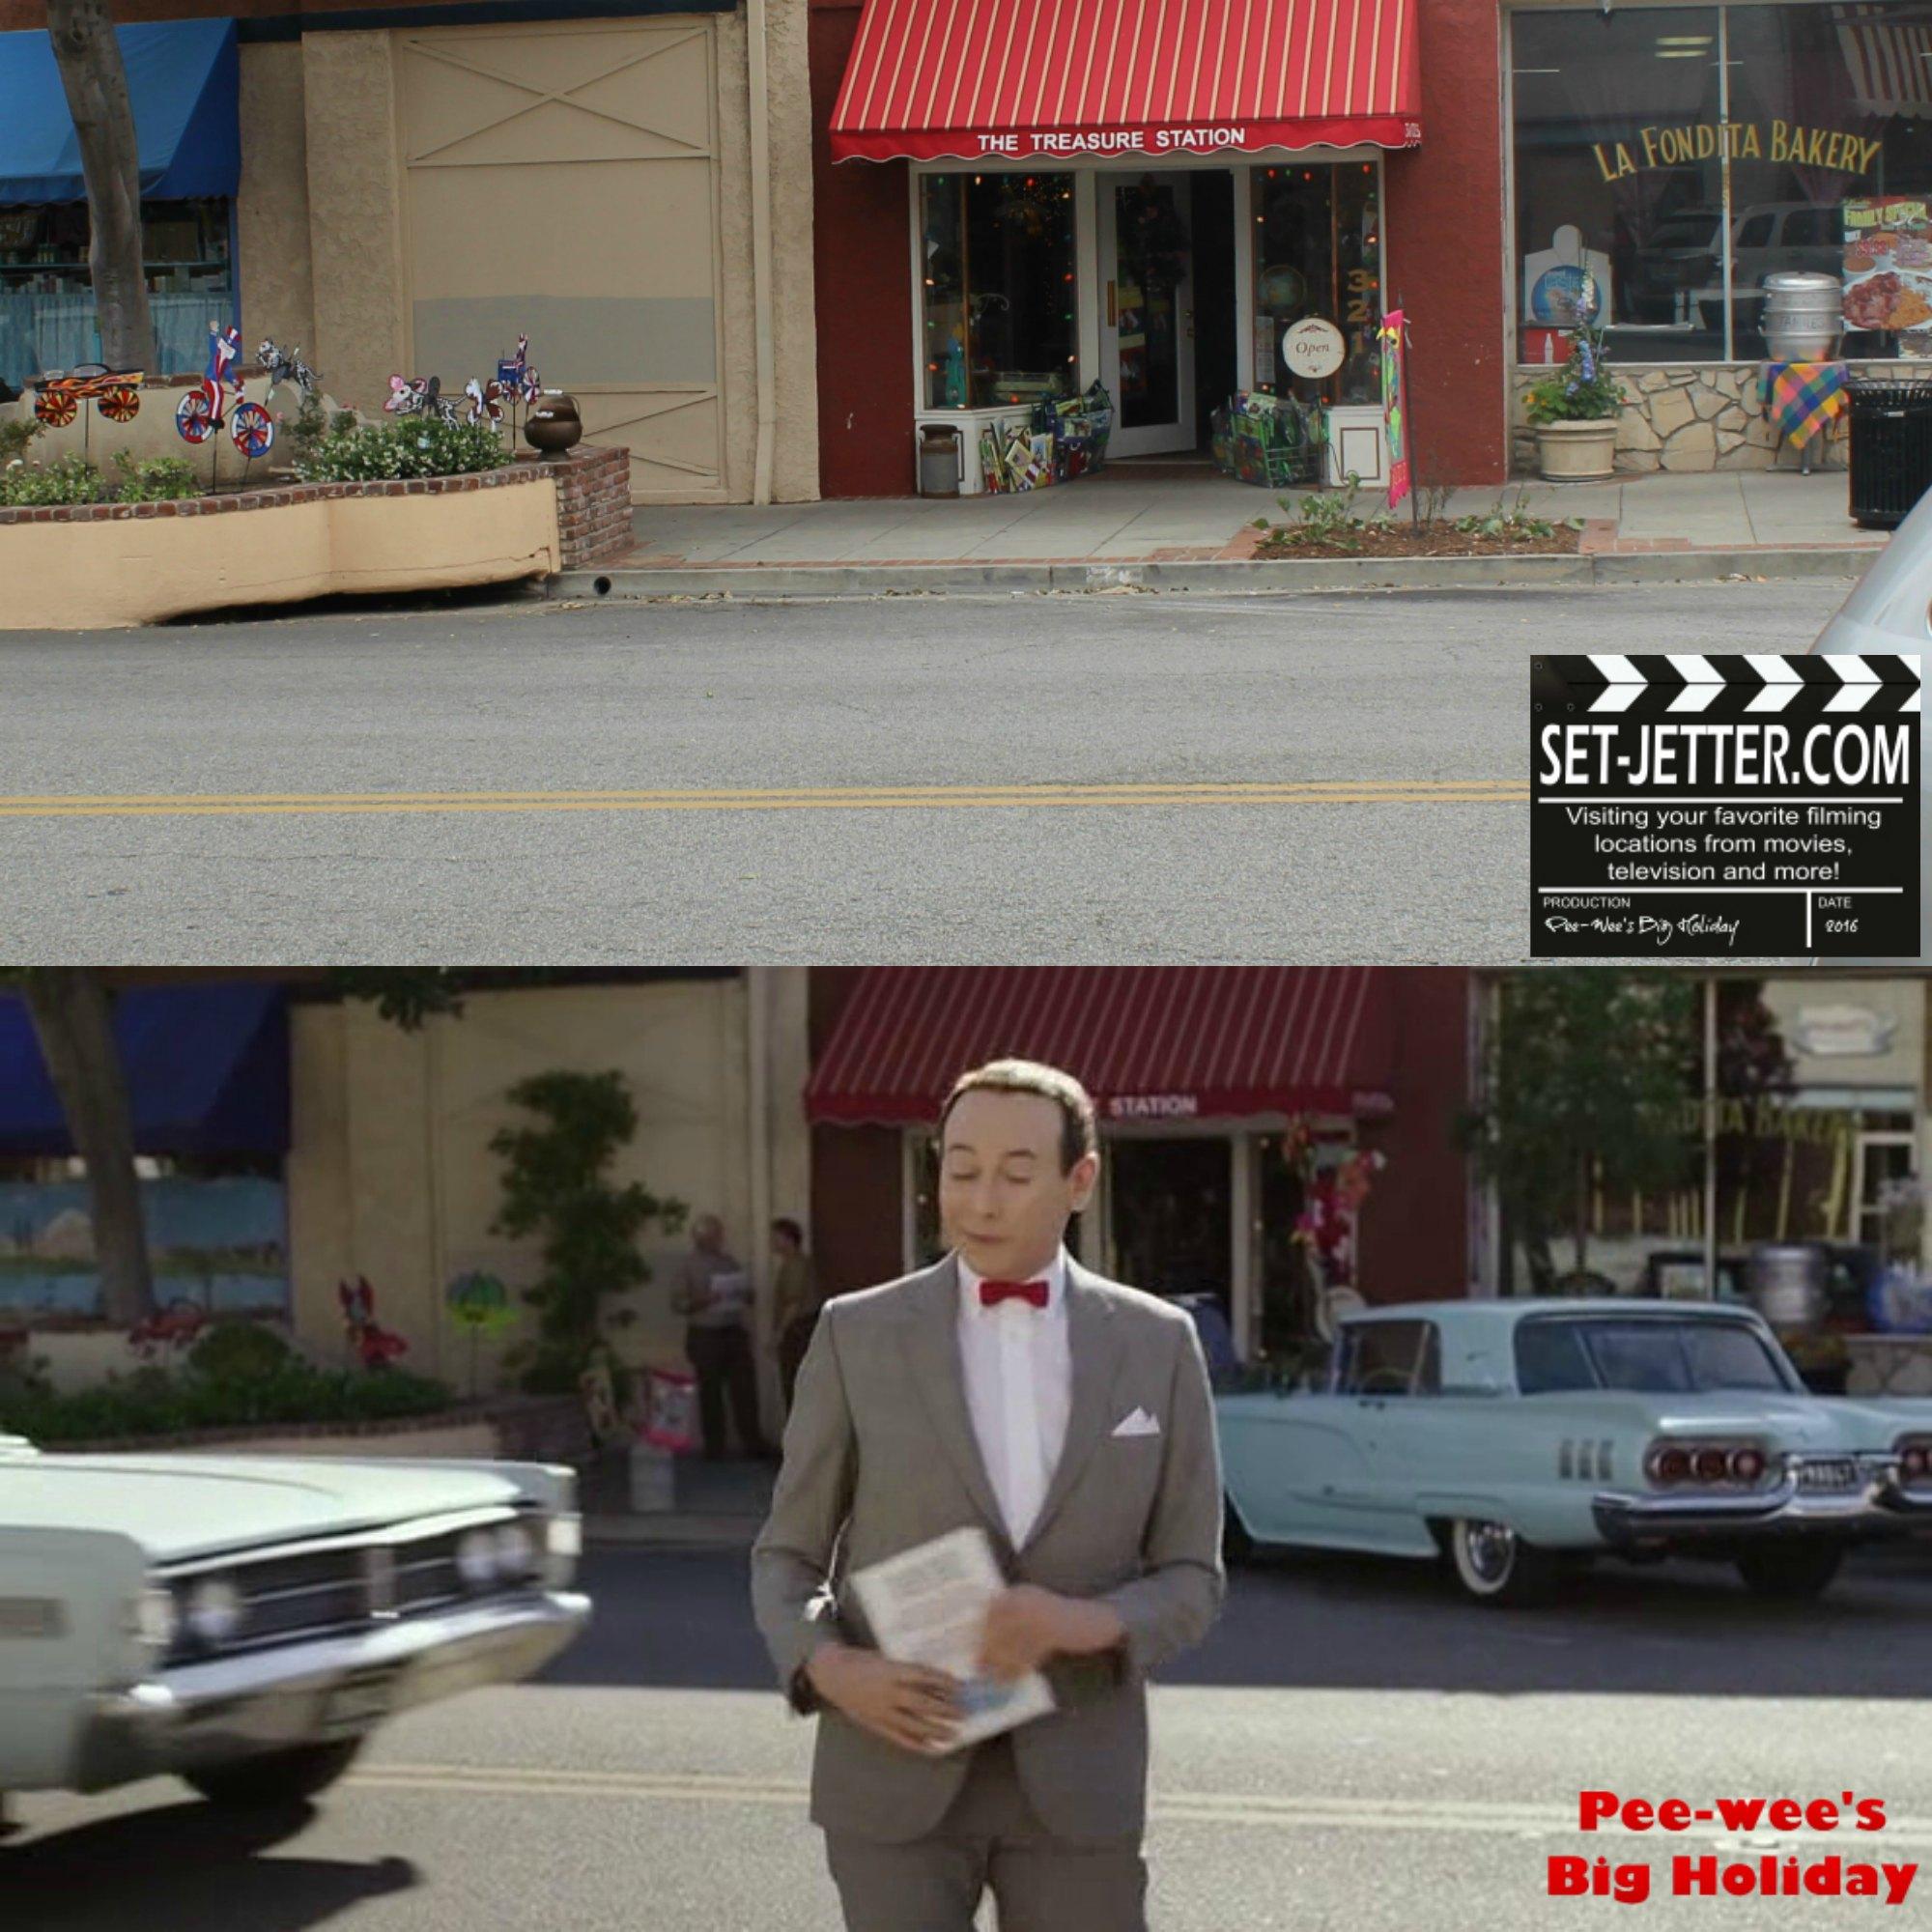 Pee Wee's Big Holiday comparison 287.jpg